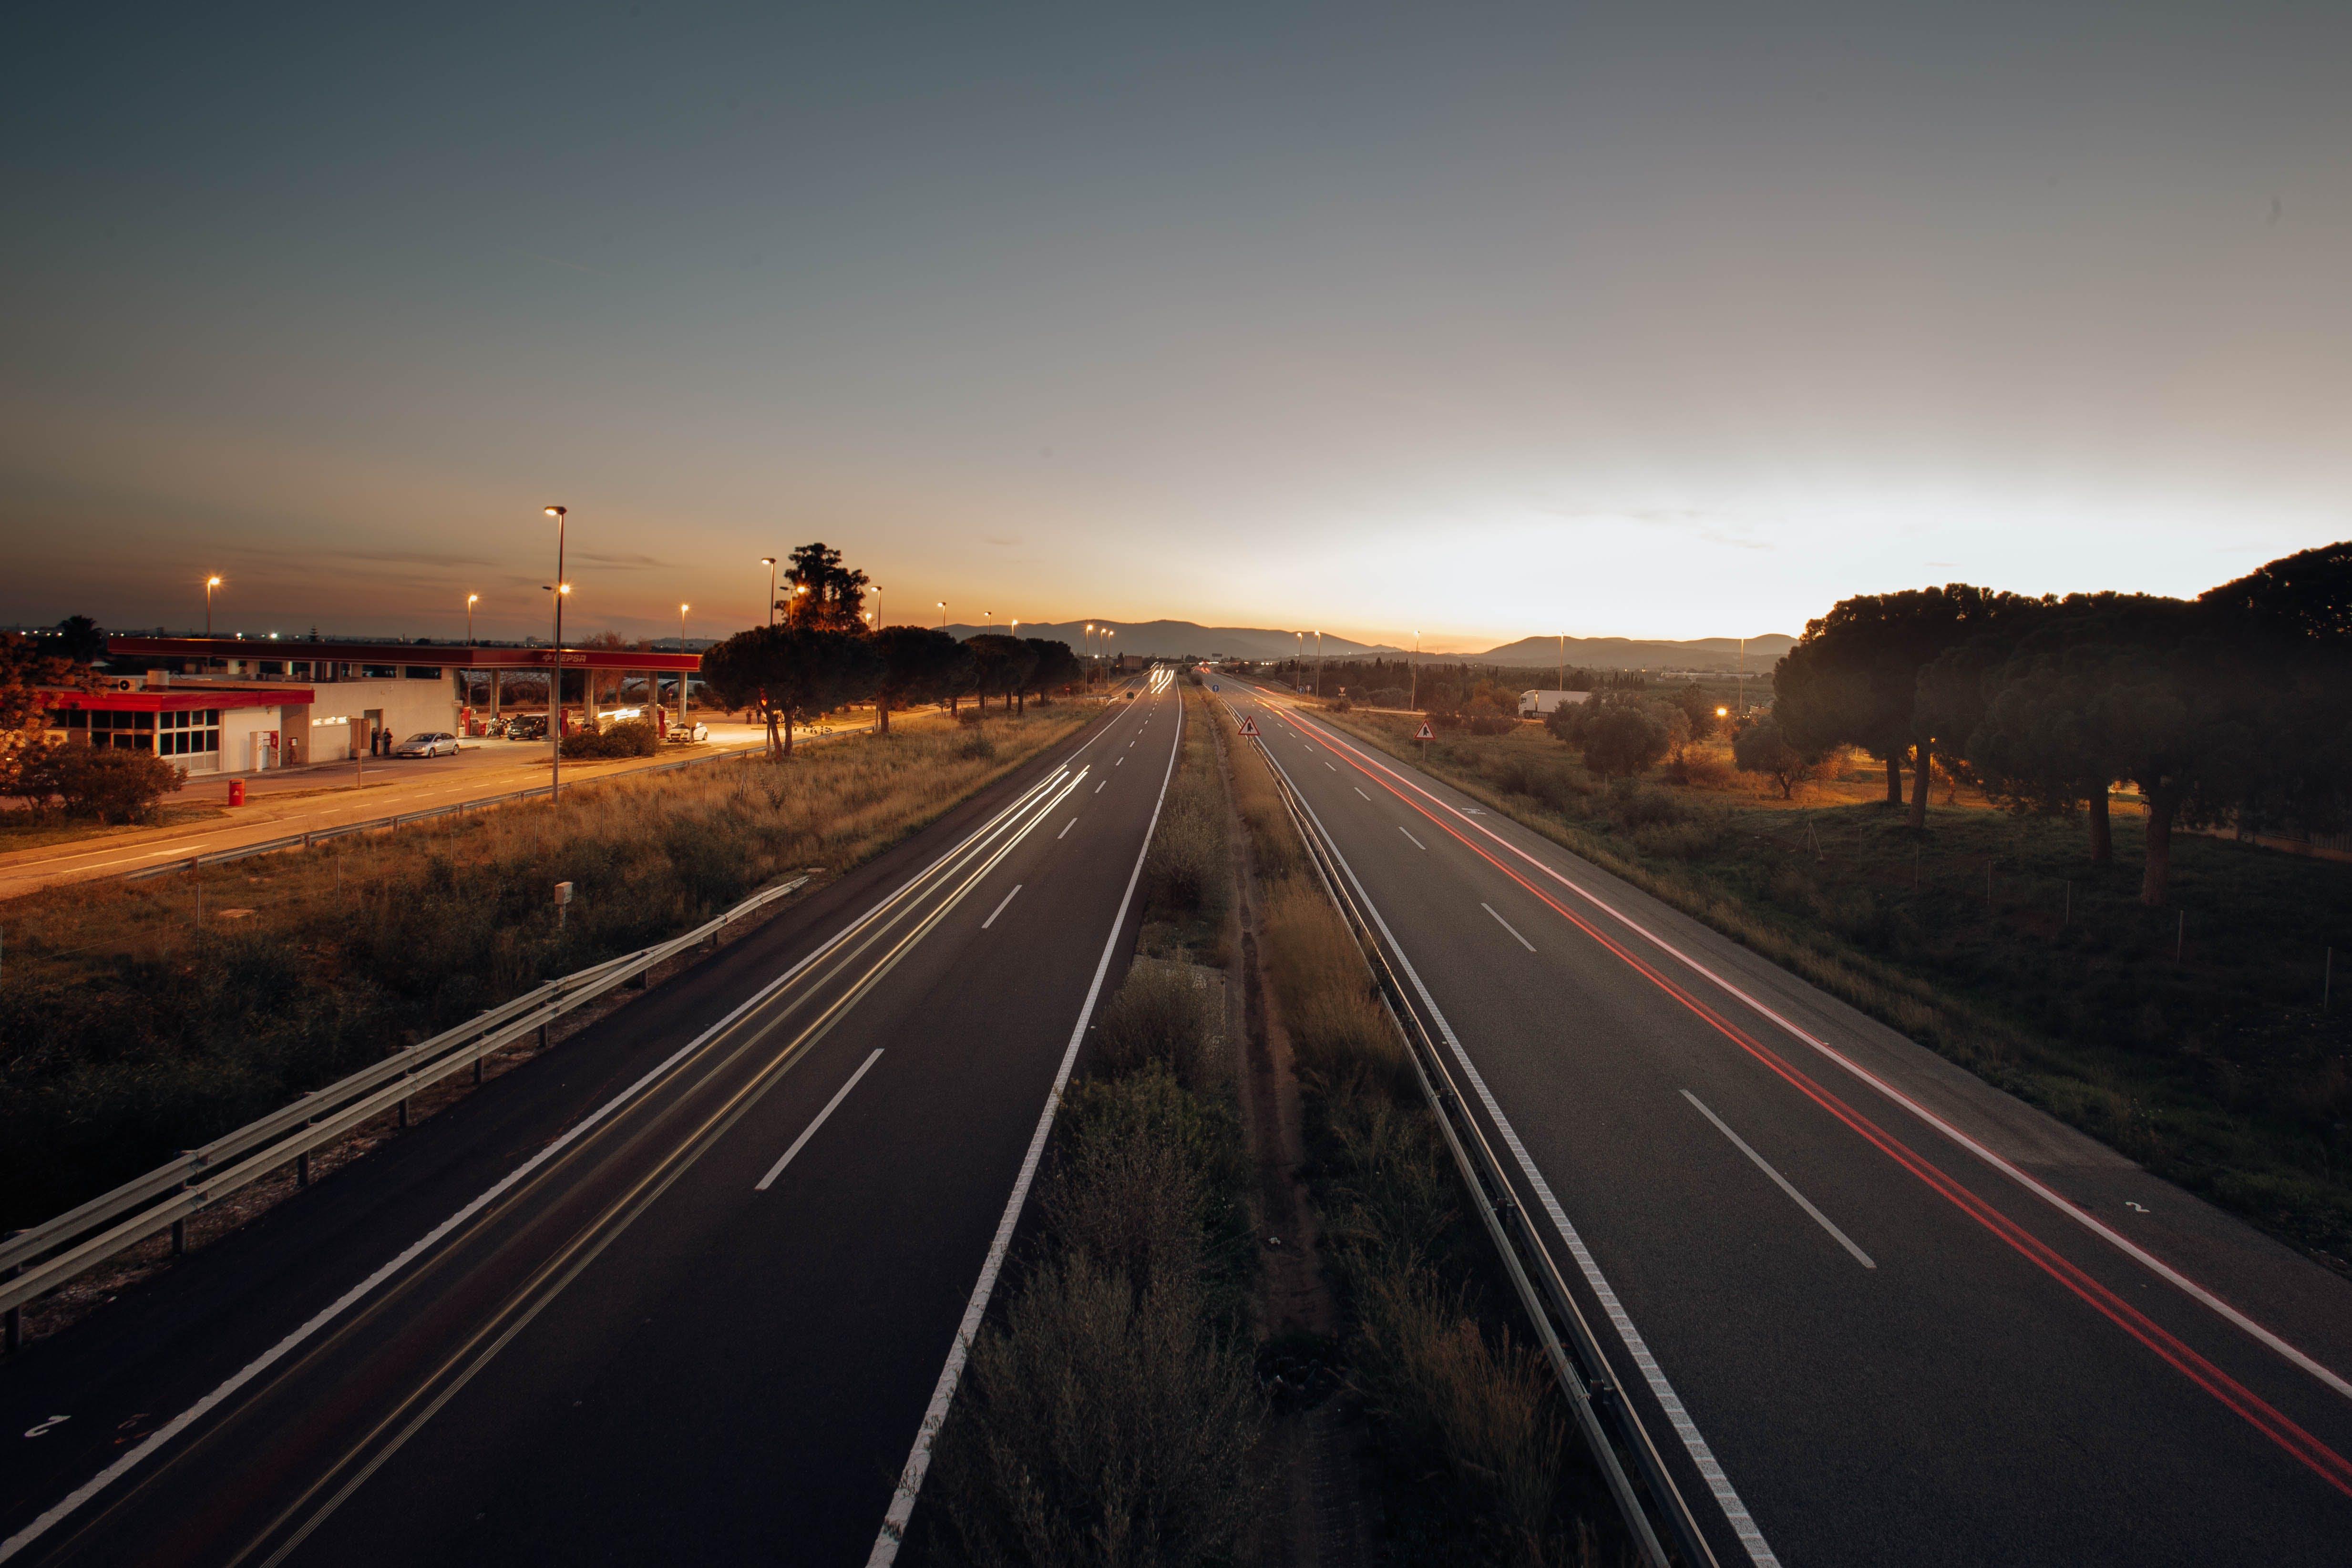 Two Asphalt Roads